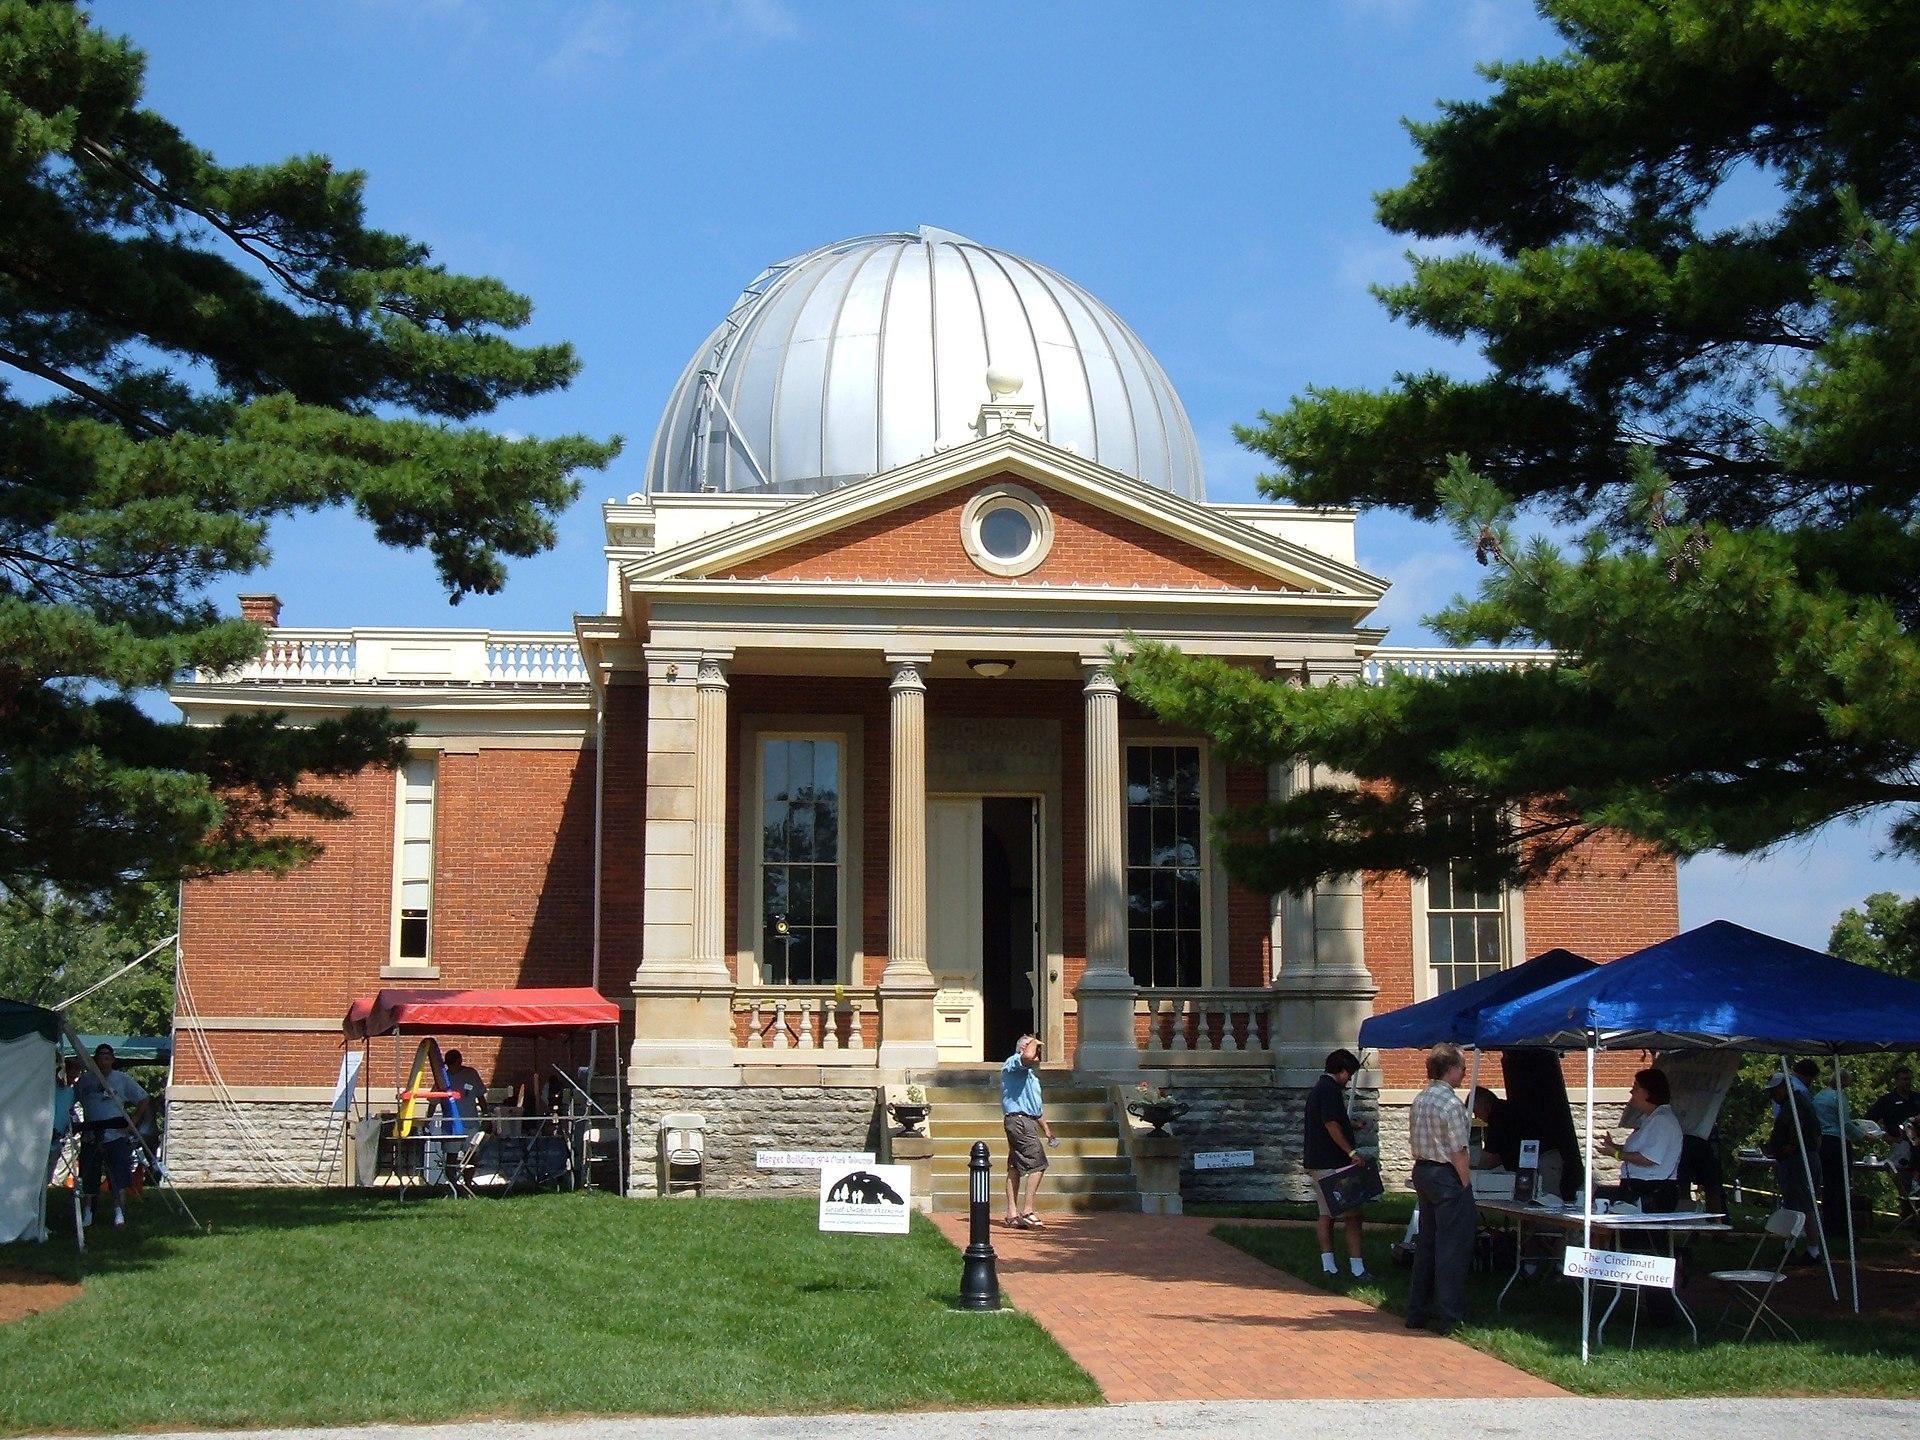 cincinnati observatory wikipedia